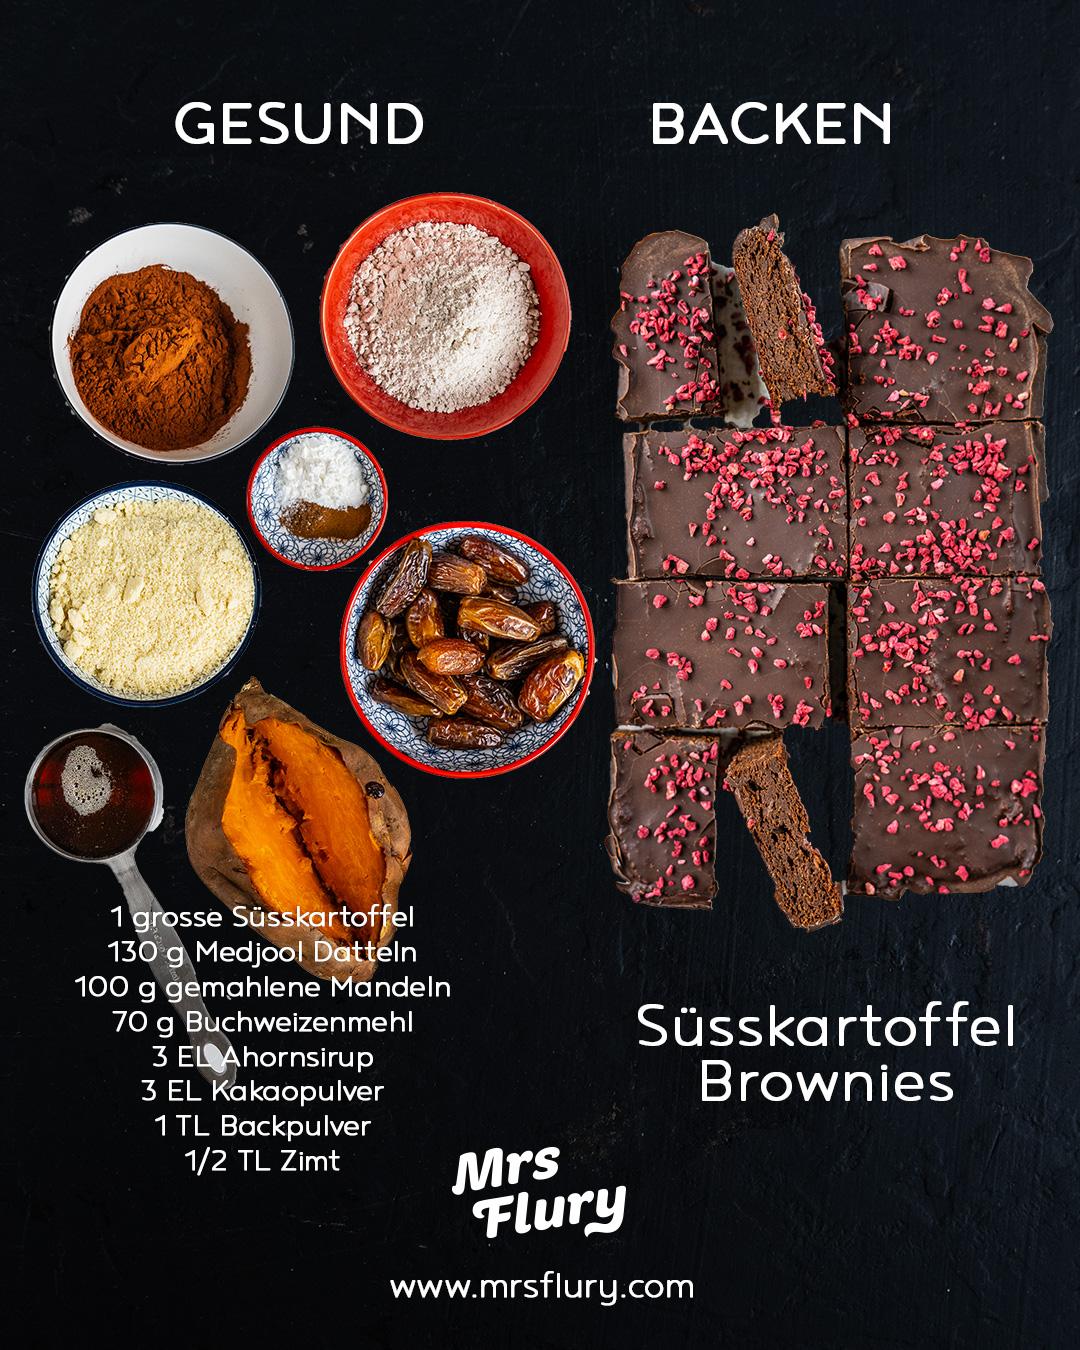 Gesunde Süsskartoffel Brownies vegan & glutenfrei Mrs Flury